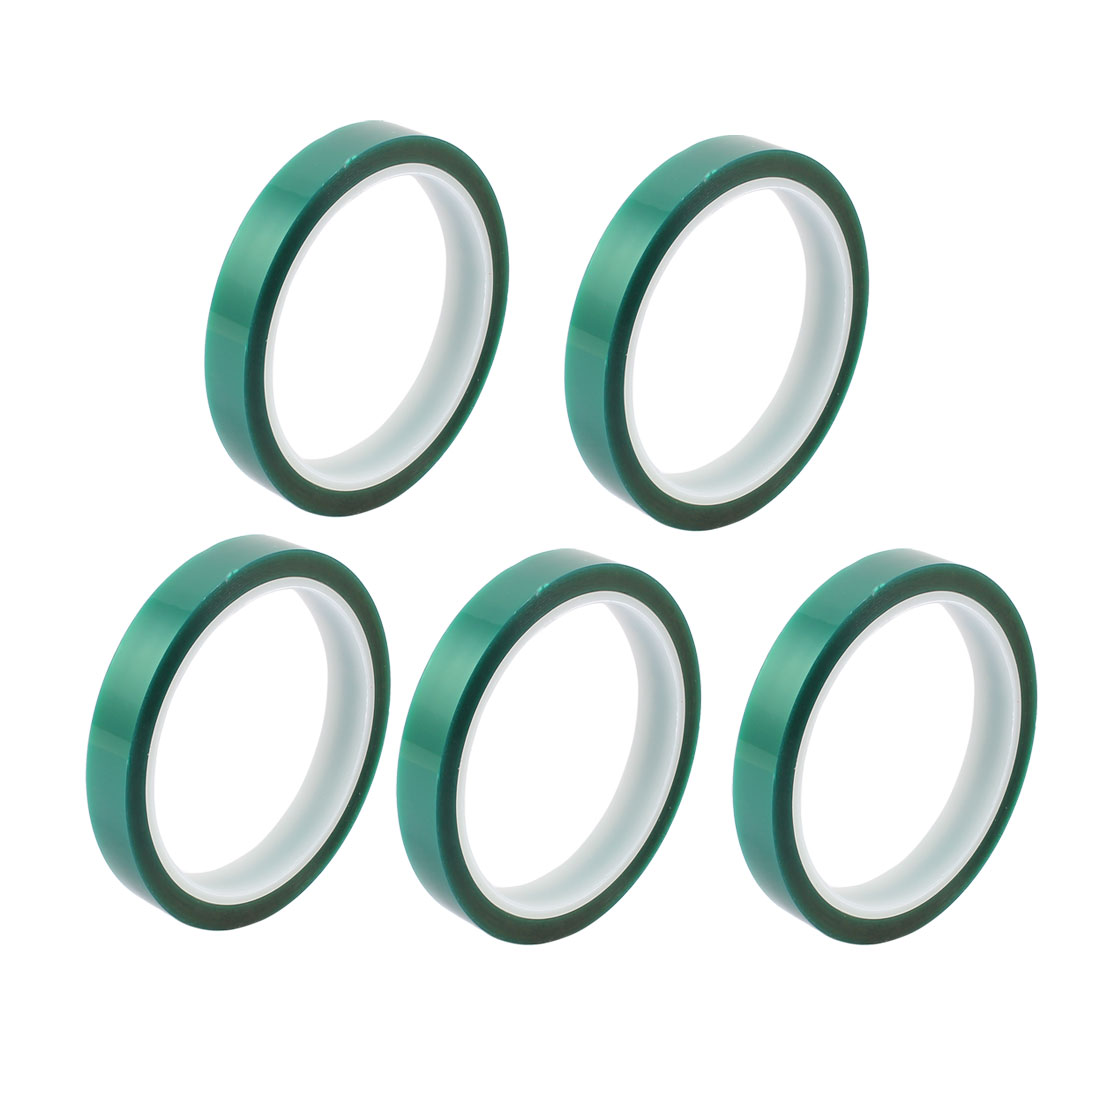 5pcs 15mm Width 33M Long Green PET High Temperature Heat Resistant PCB Solder Tape